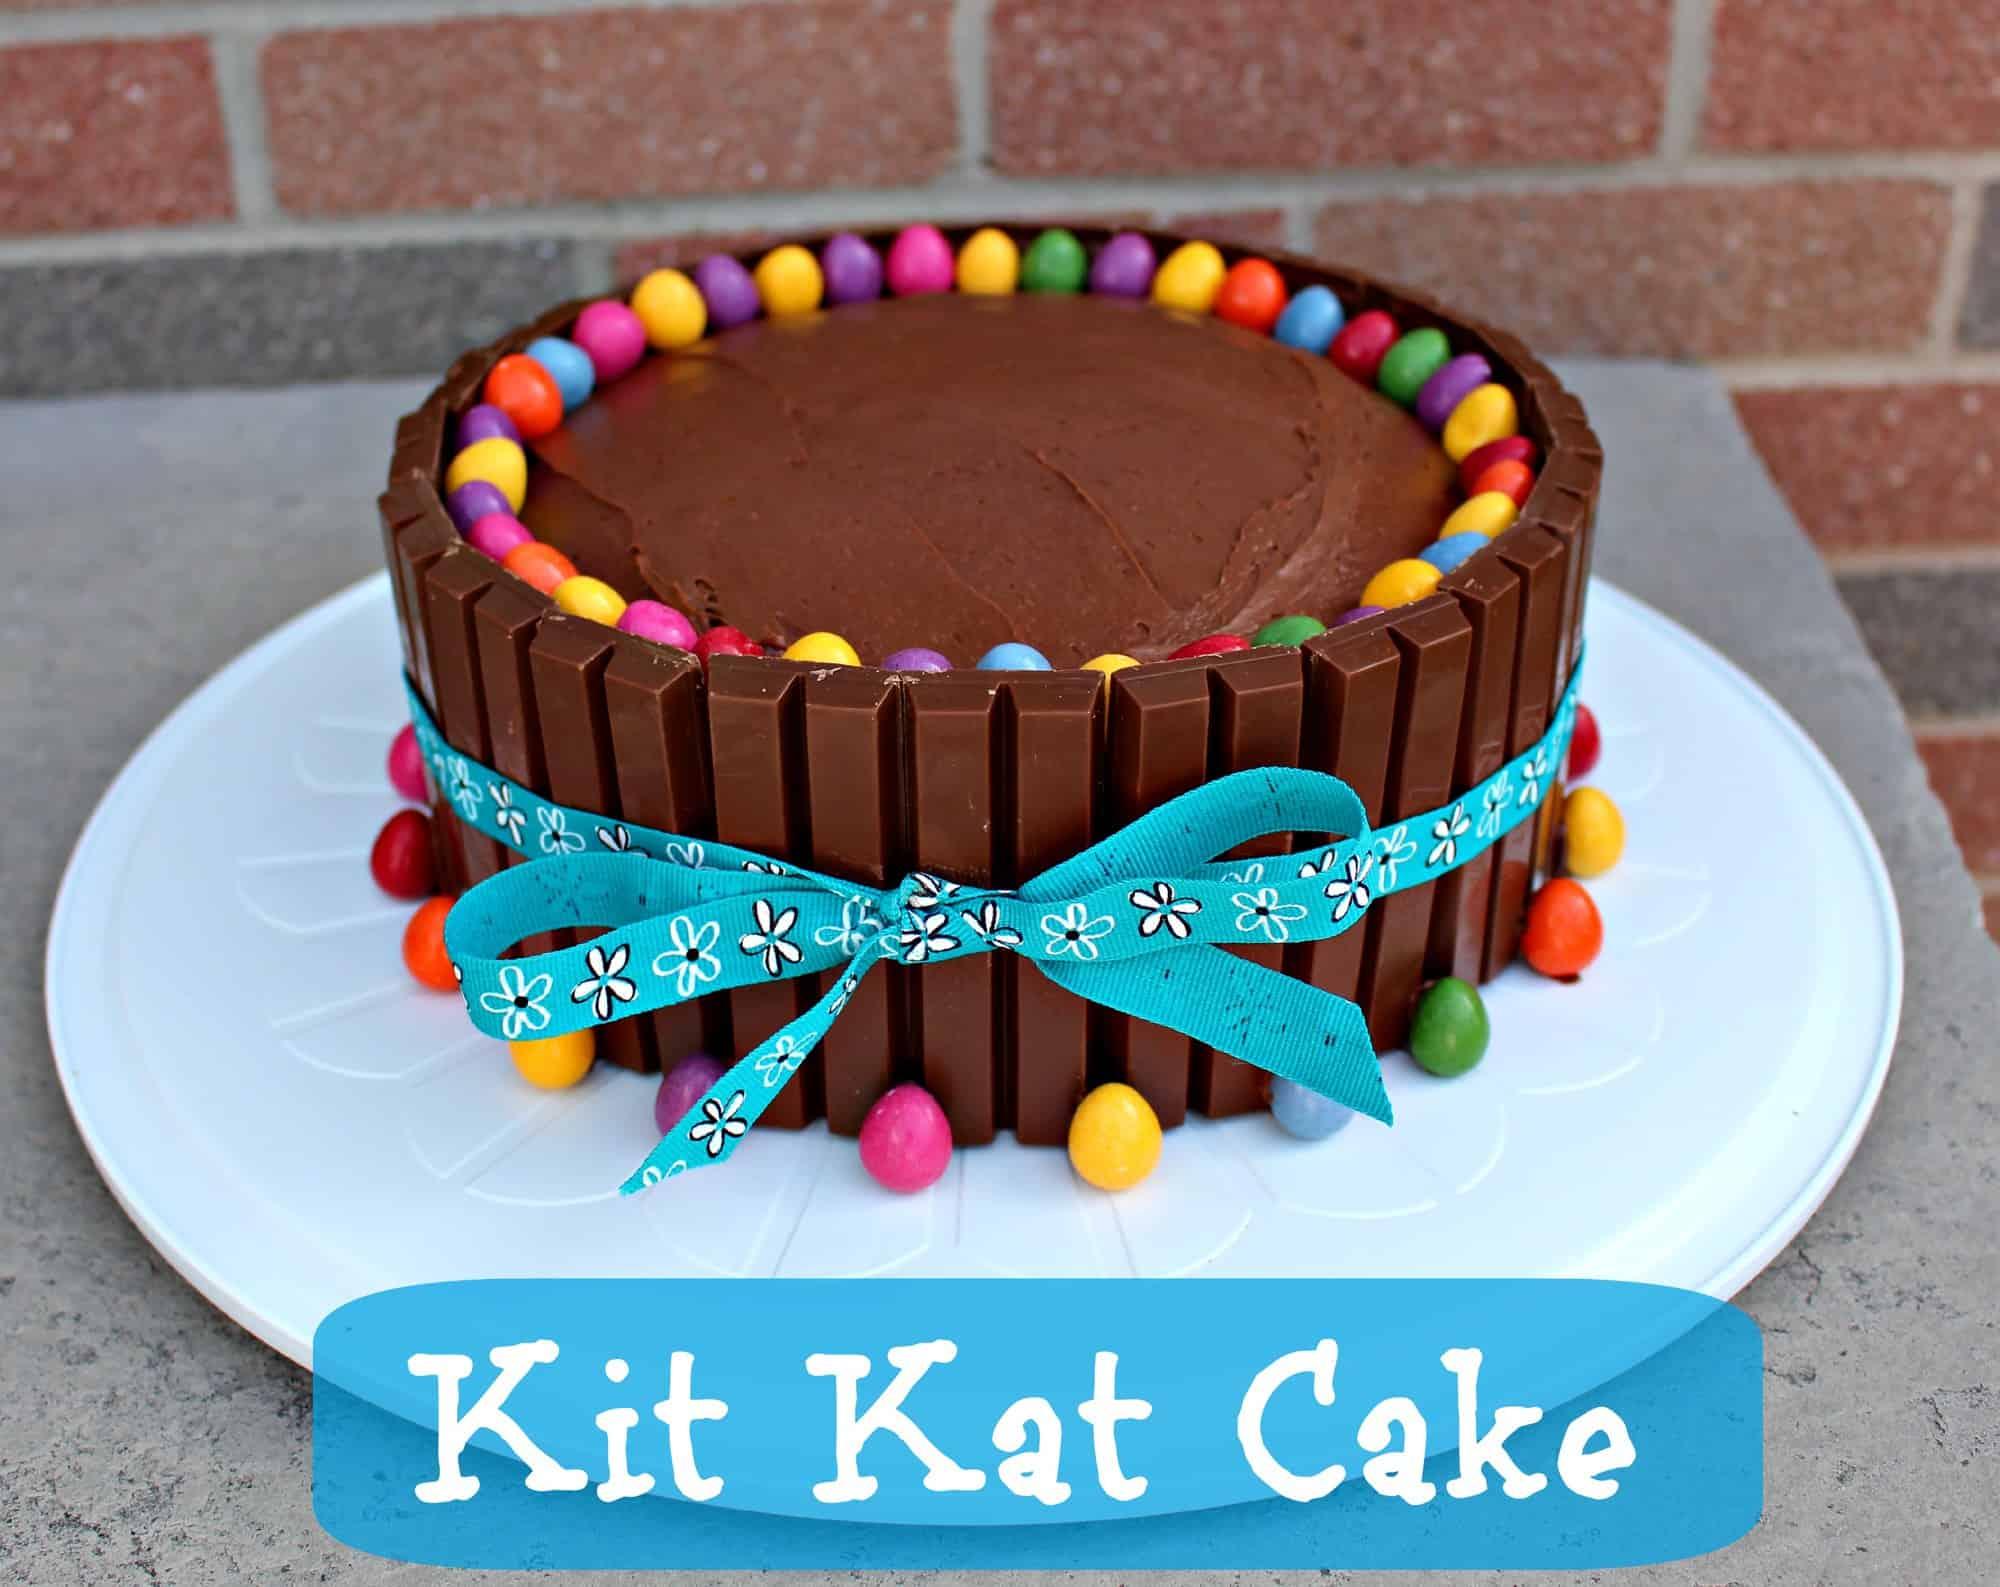 KitKat Cake Recipe – Easy Birthday Cake Ideas